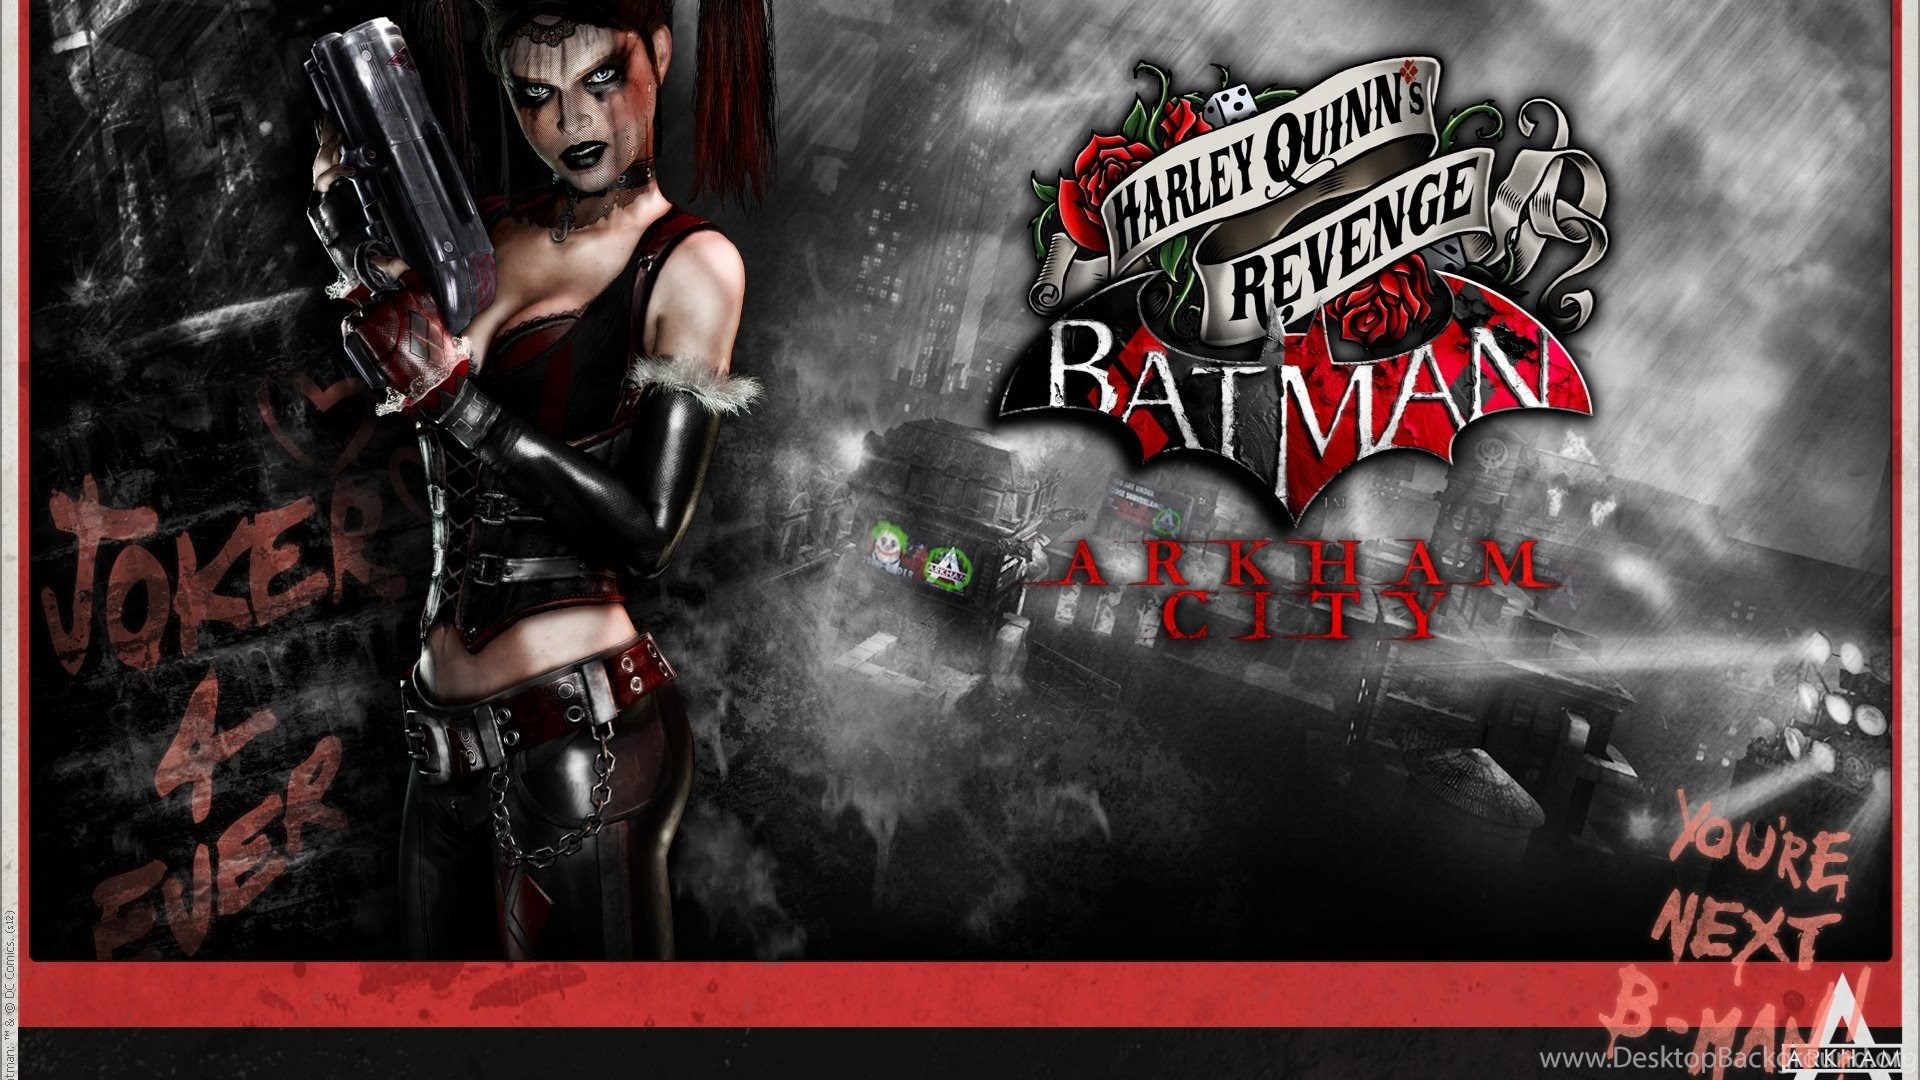 Arkham Knight Harley Quinn Wallpapers Desktop Background